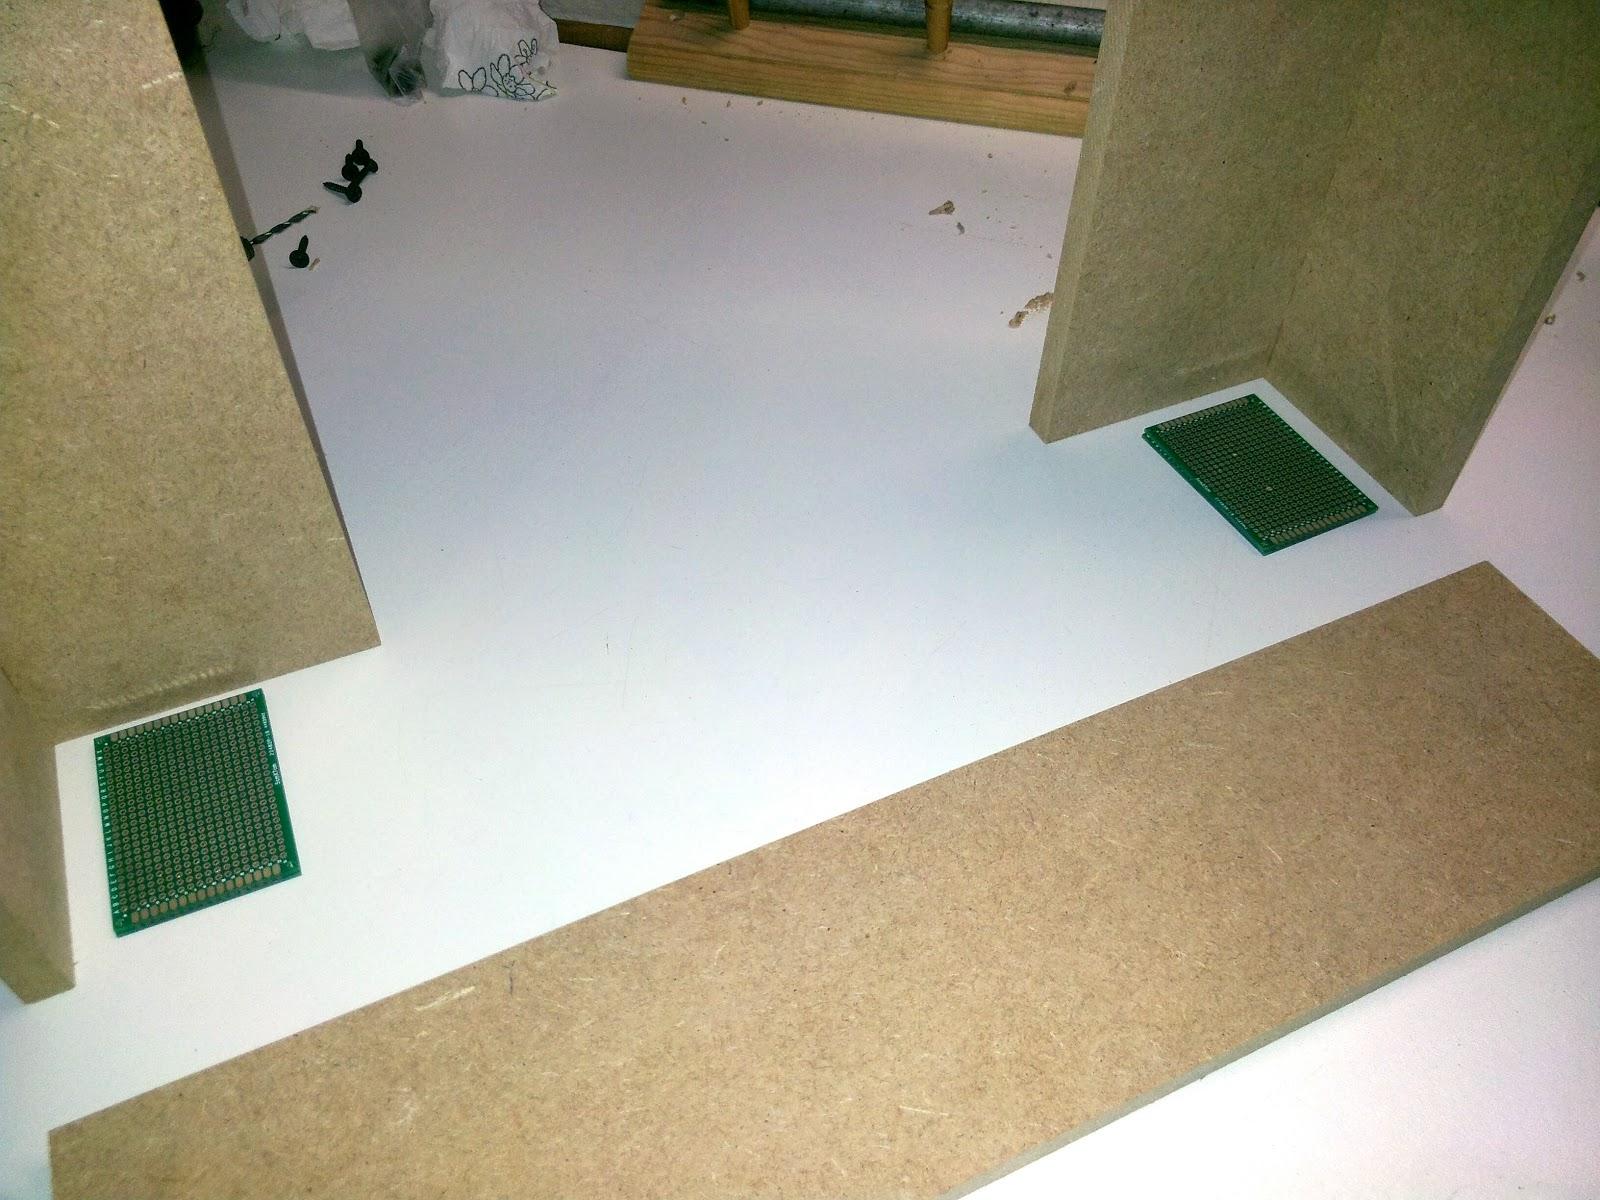 assemblage du cadre en bois construction d 39 une imprimante 3d reprap prusa i3. Black Bedroom Furniture Sets. Home Design Ideas